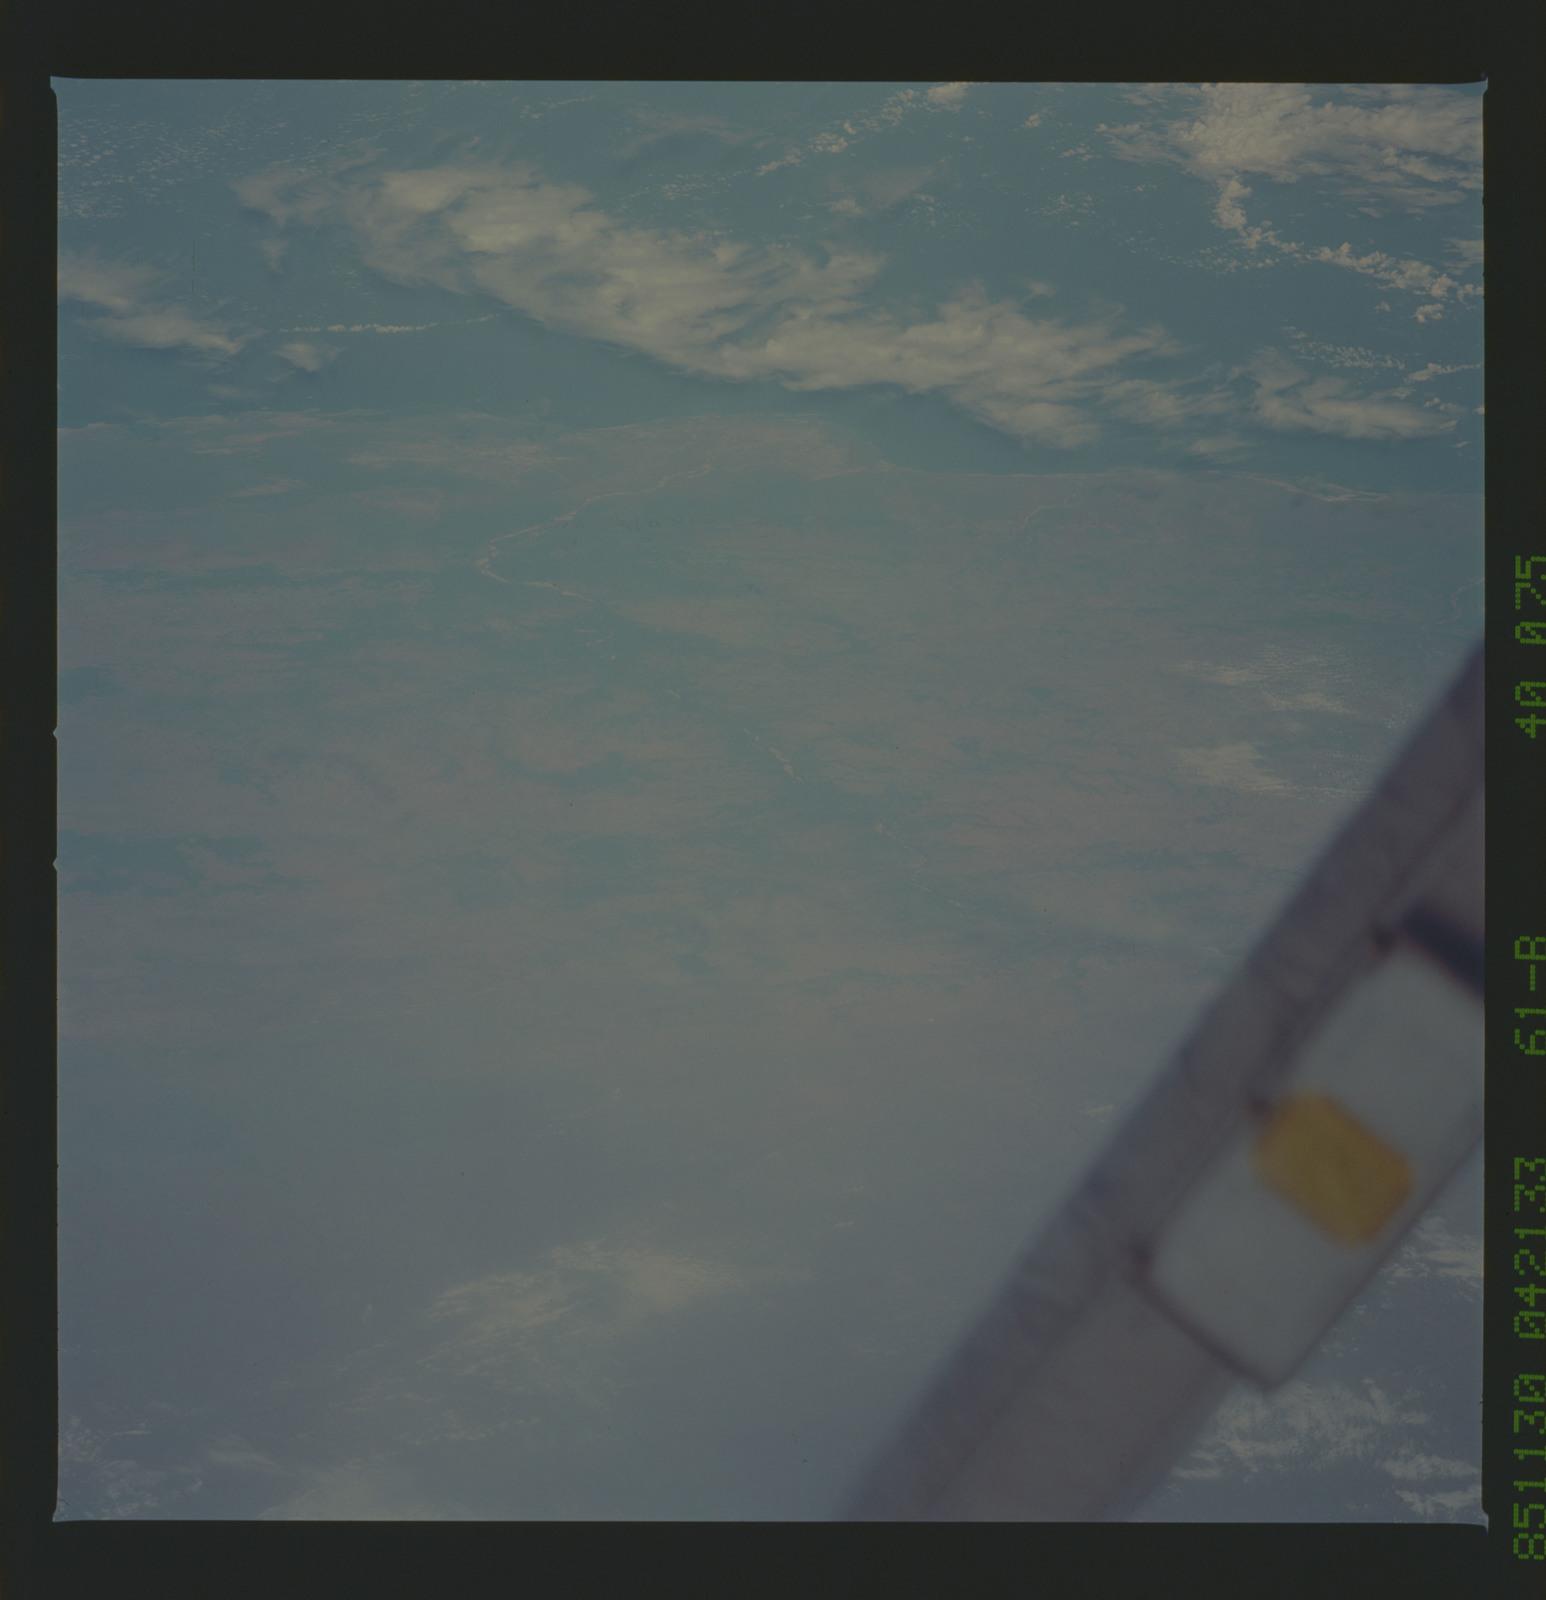 61B-40-075 - STS-61B - STS-61B earth observations